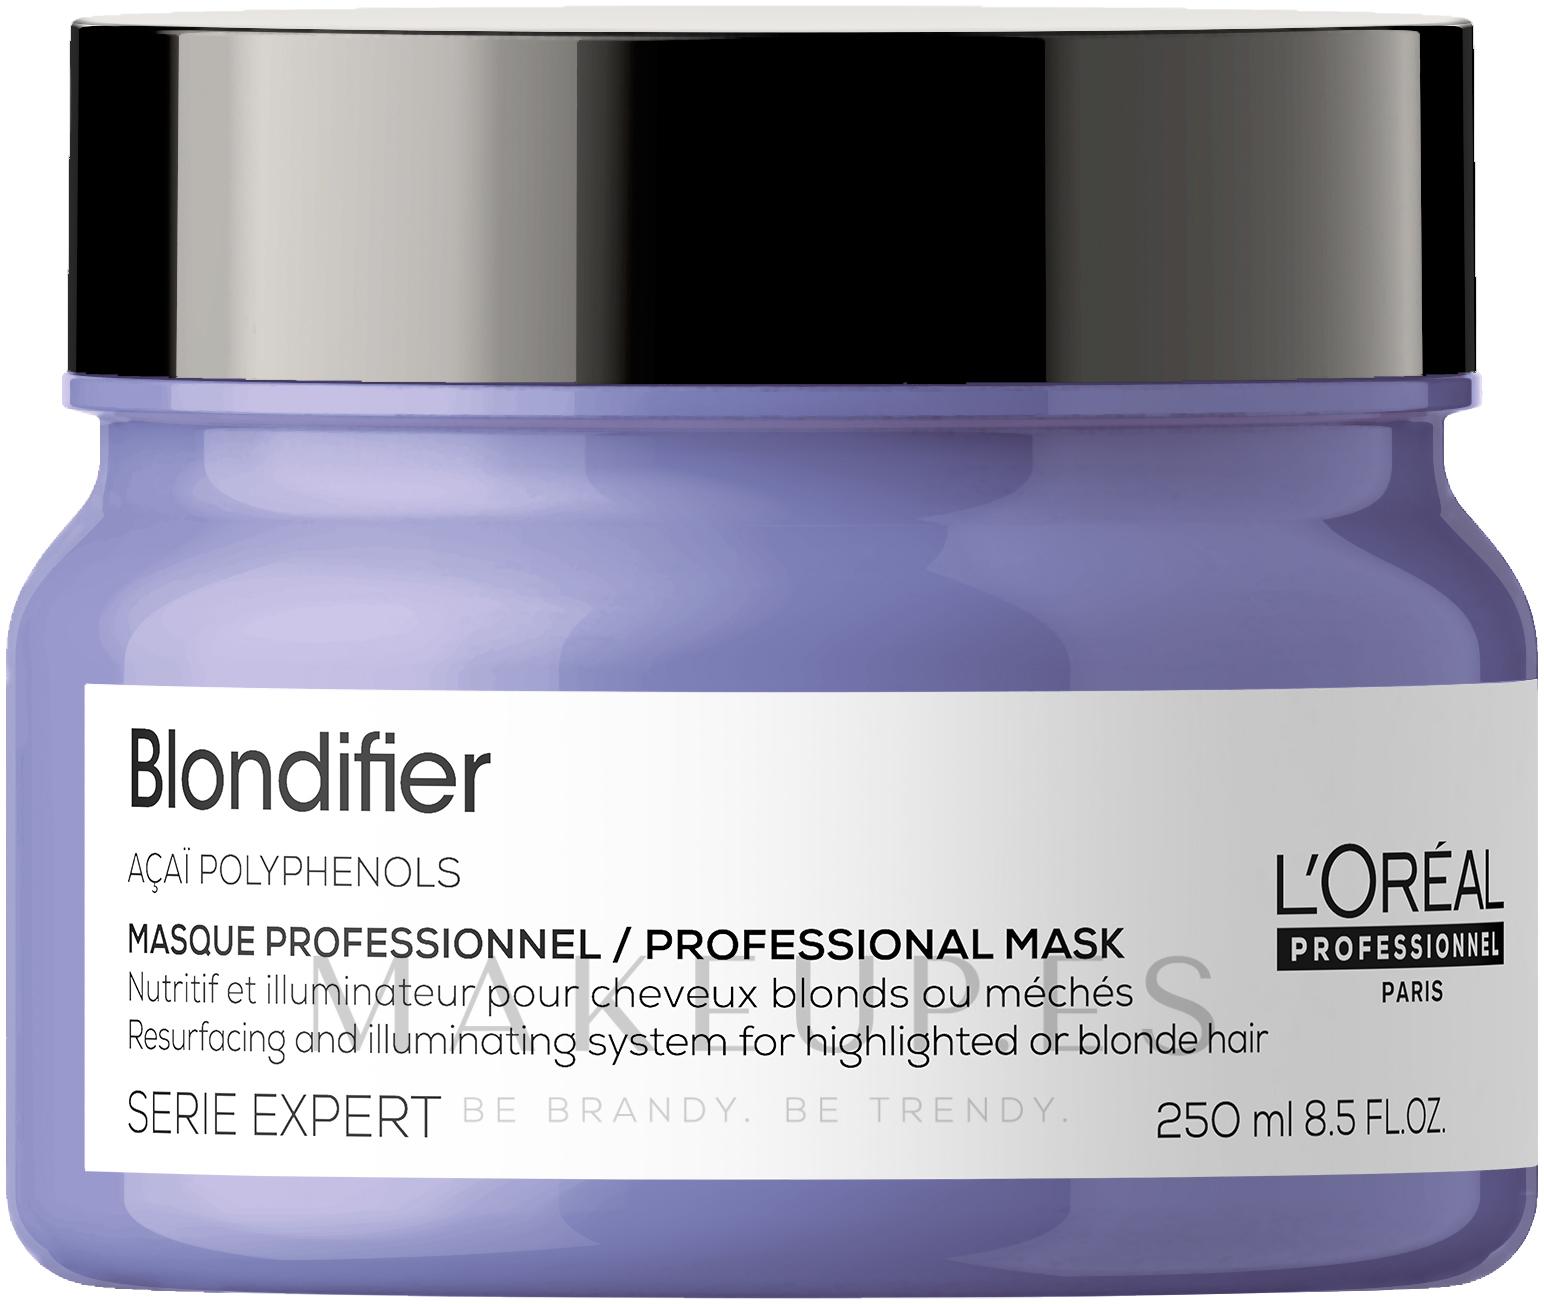 Mascarilla capilar iluminadora con aceite de coco y polifenol de acai - L'Oreal Professionnel Serie Expert Blondifier Masque — imagen 250 ml NEW